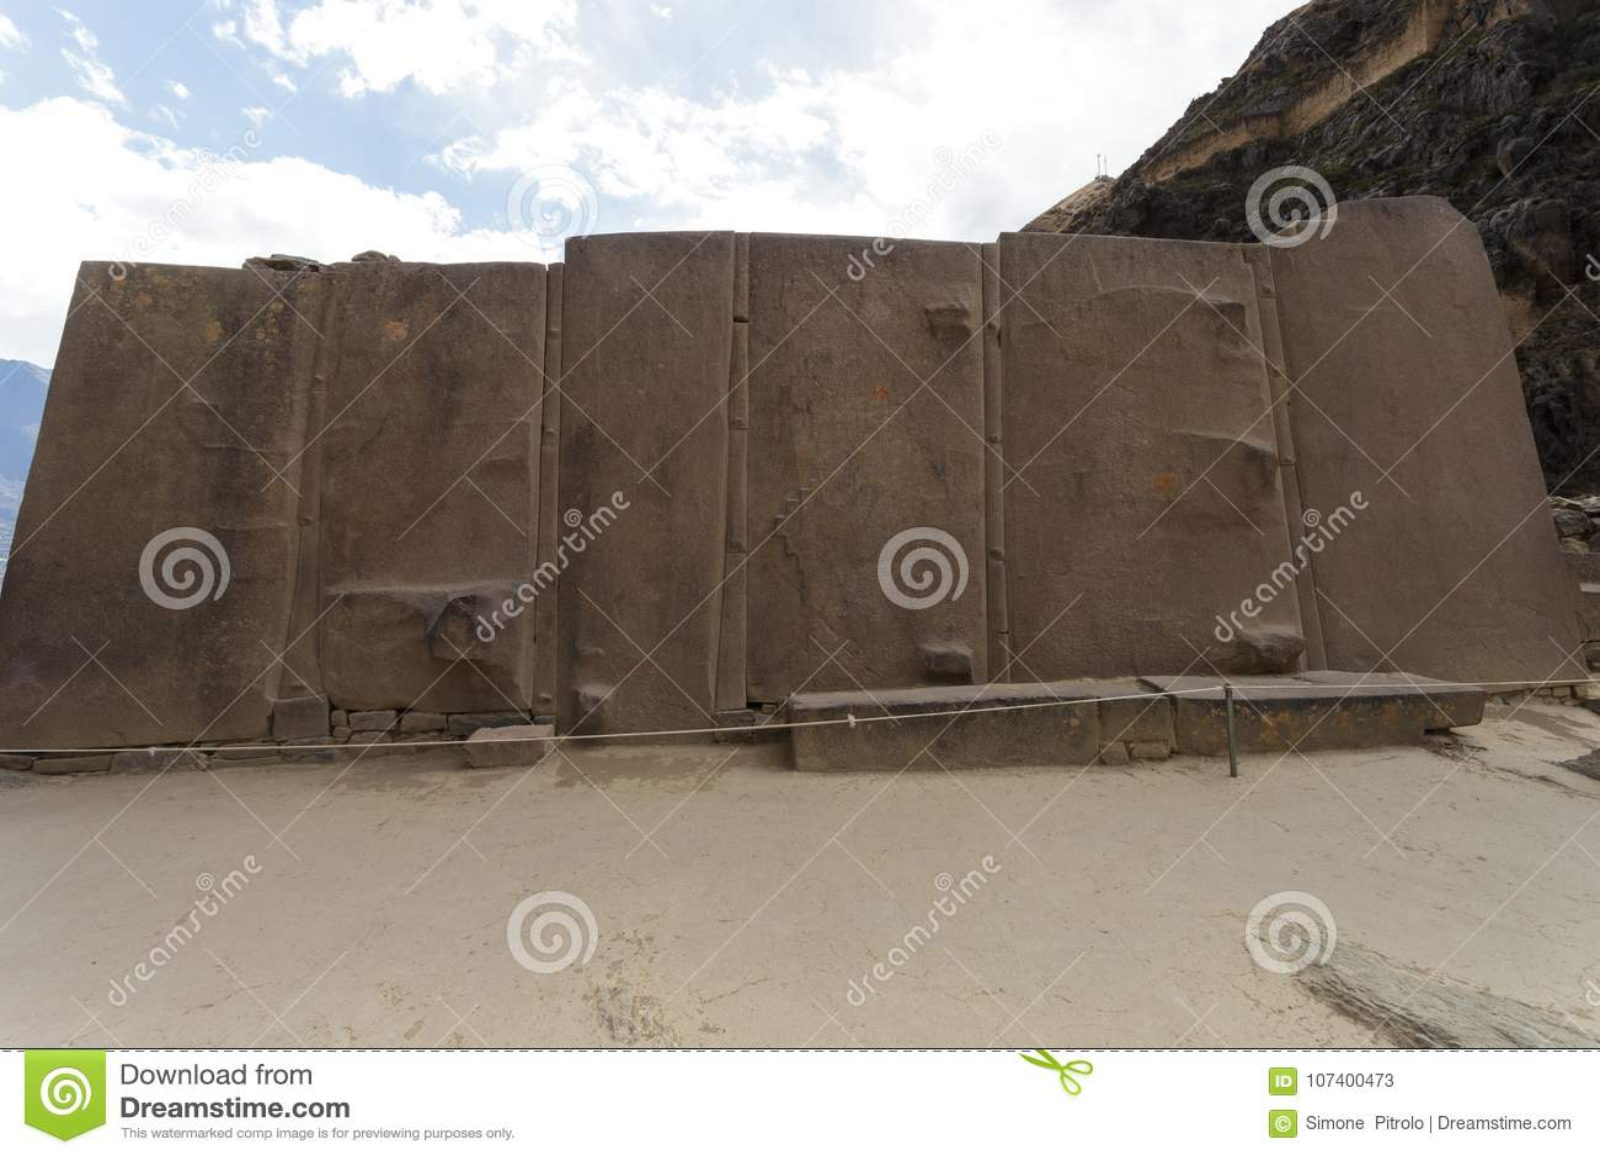 Olantaytamboo,Wall of the Six Monoliths, Inca, Peru